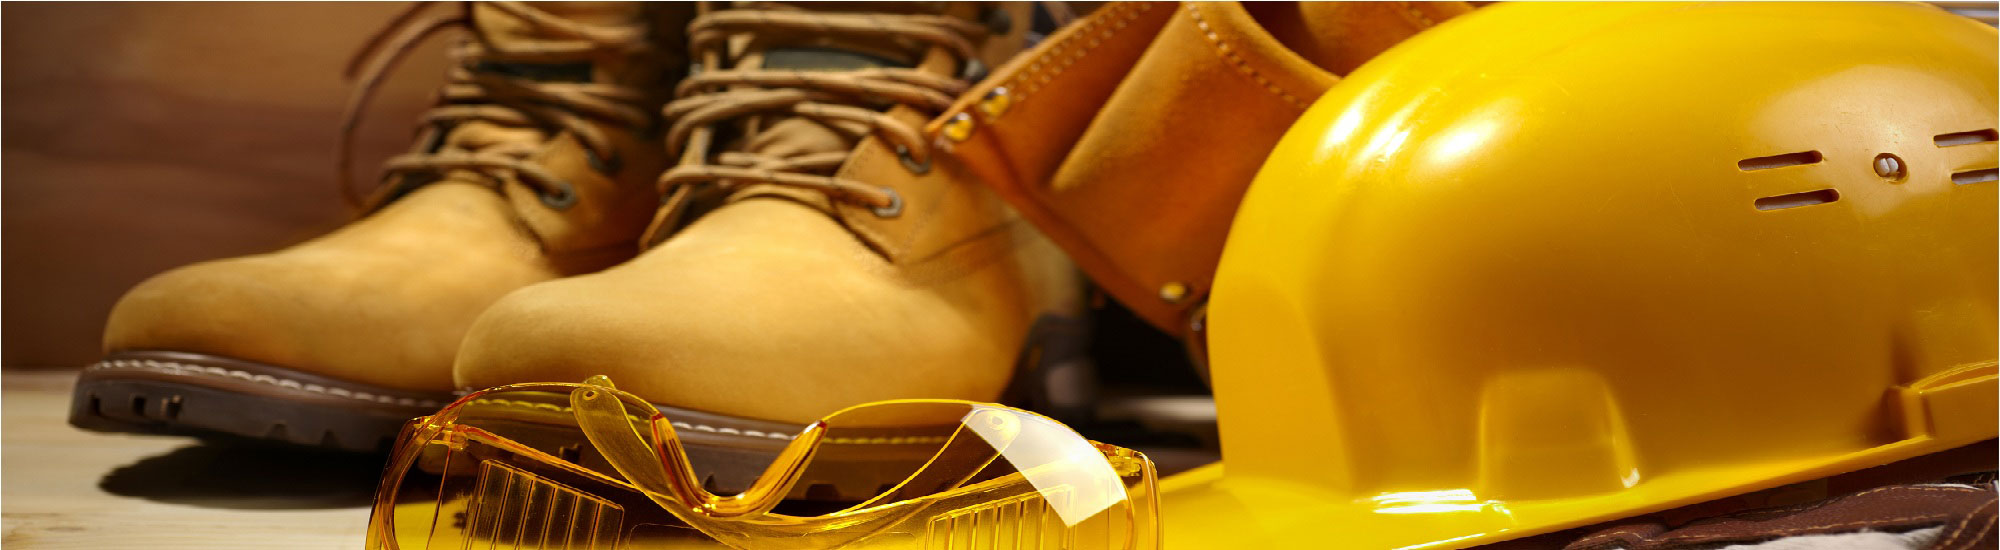 Revolution-Slider-boots